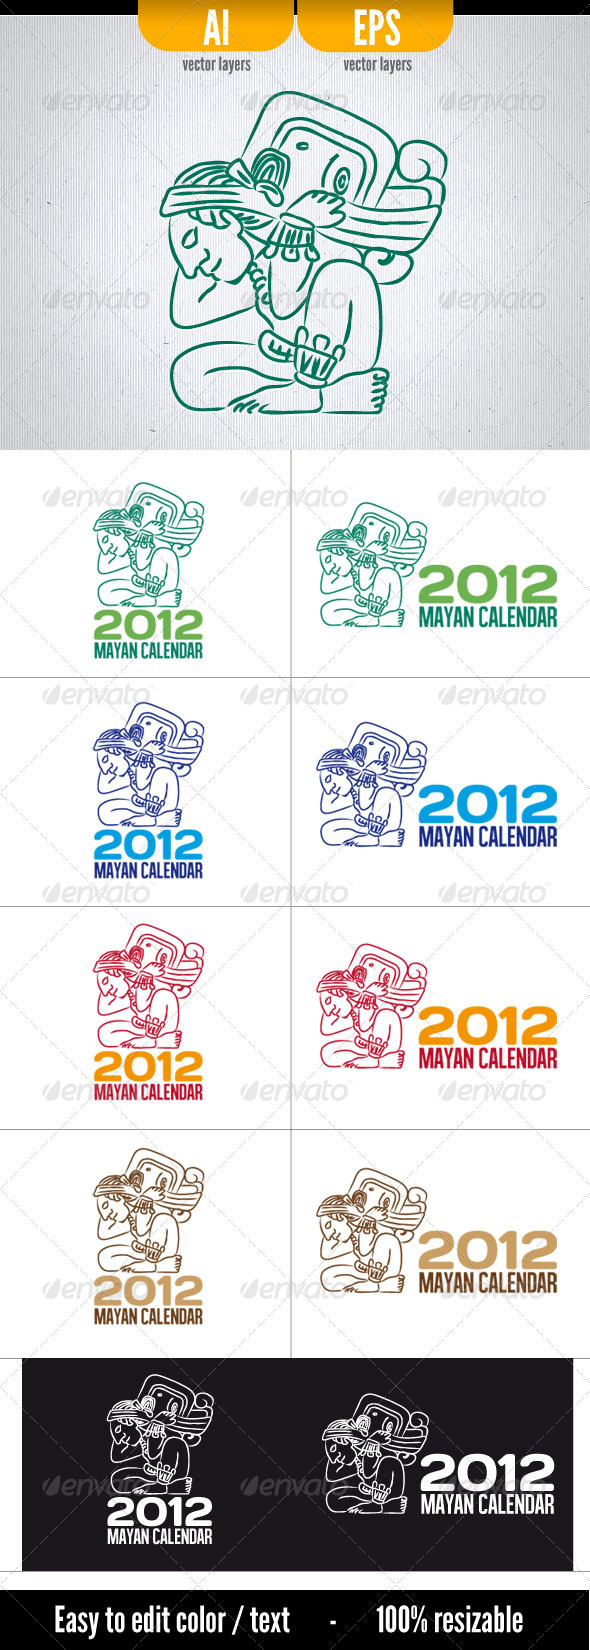 2012 Mayan Calendar